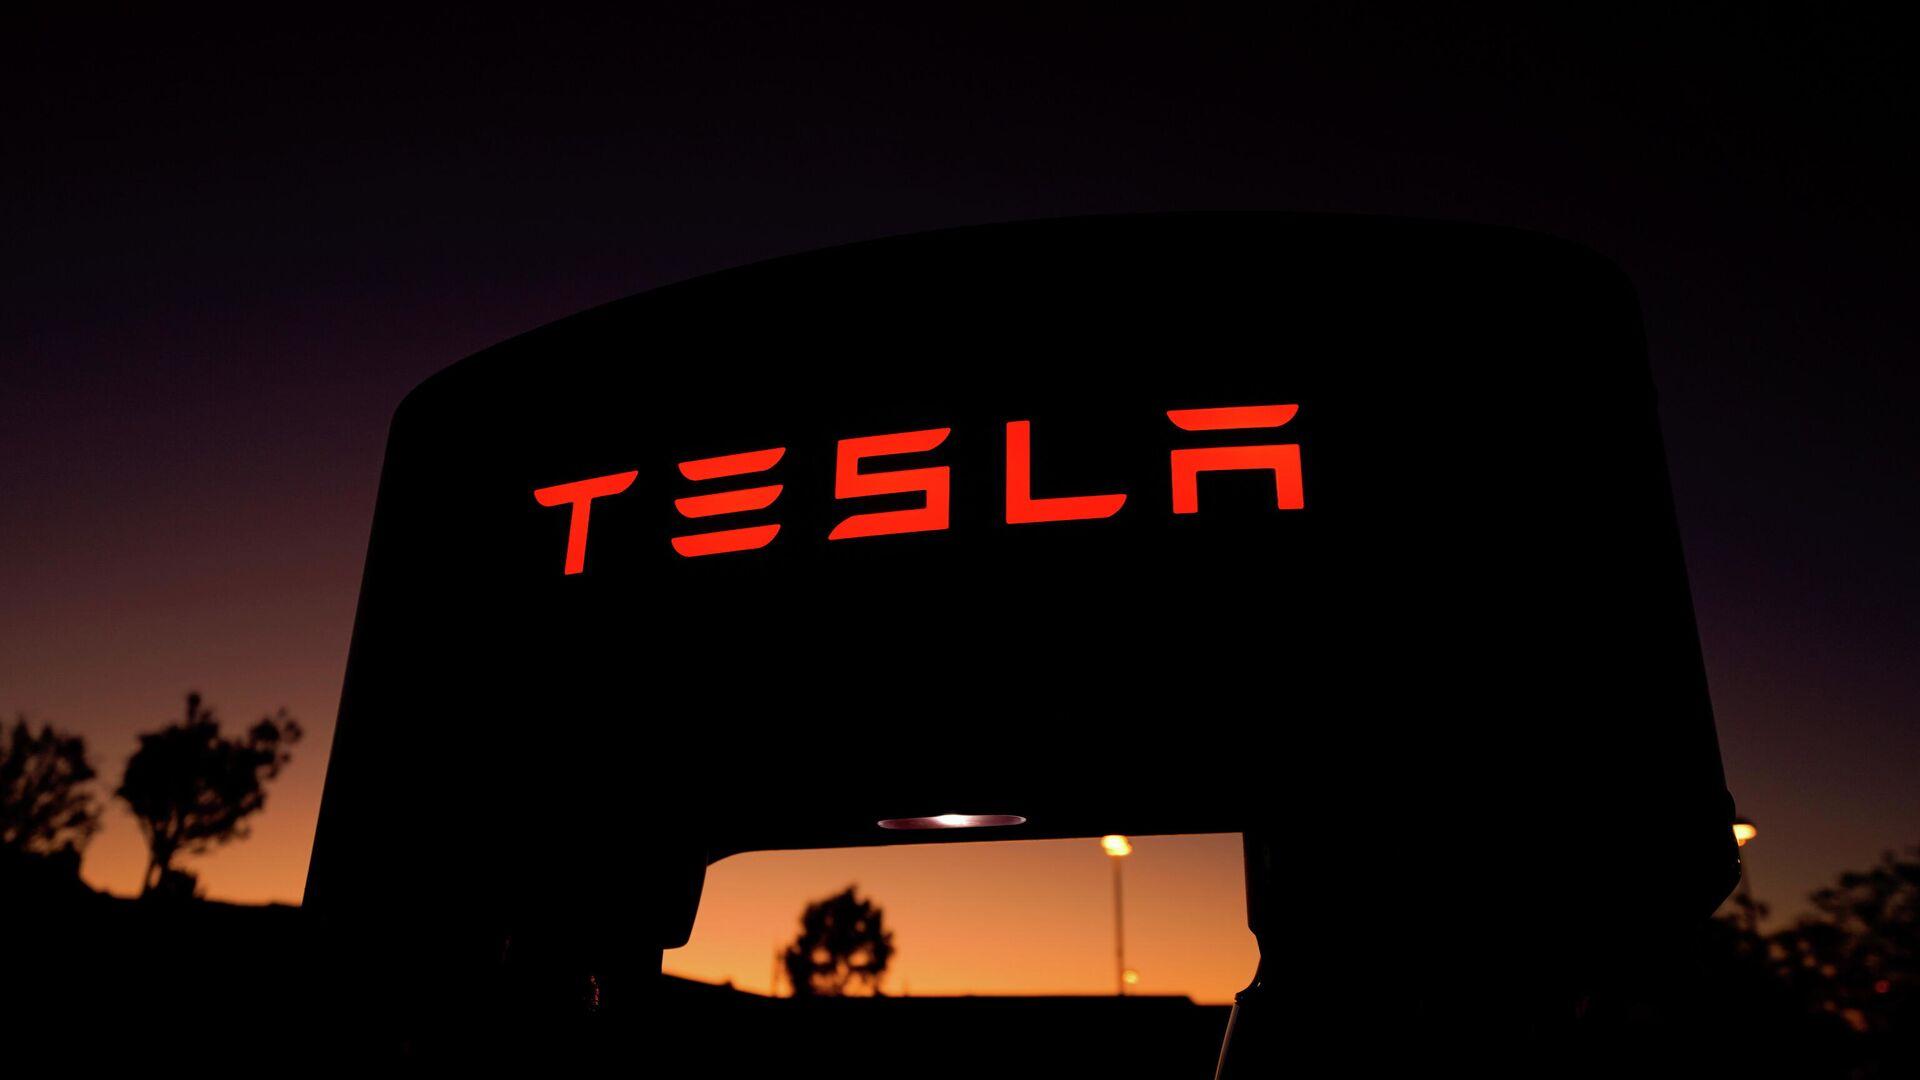 Tesla-Ladestation in Kalifornien, USA - SNA, 1920, 03.05.2021